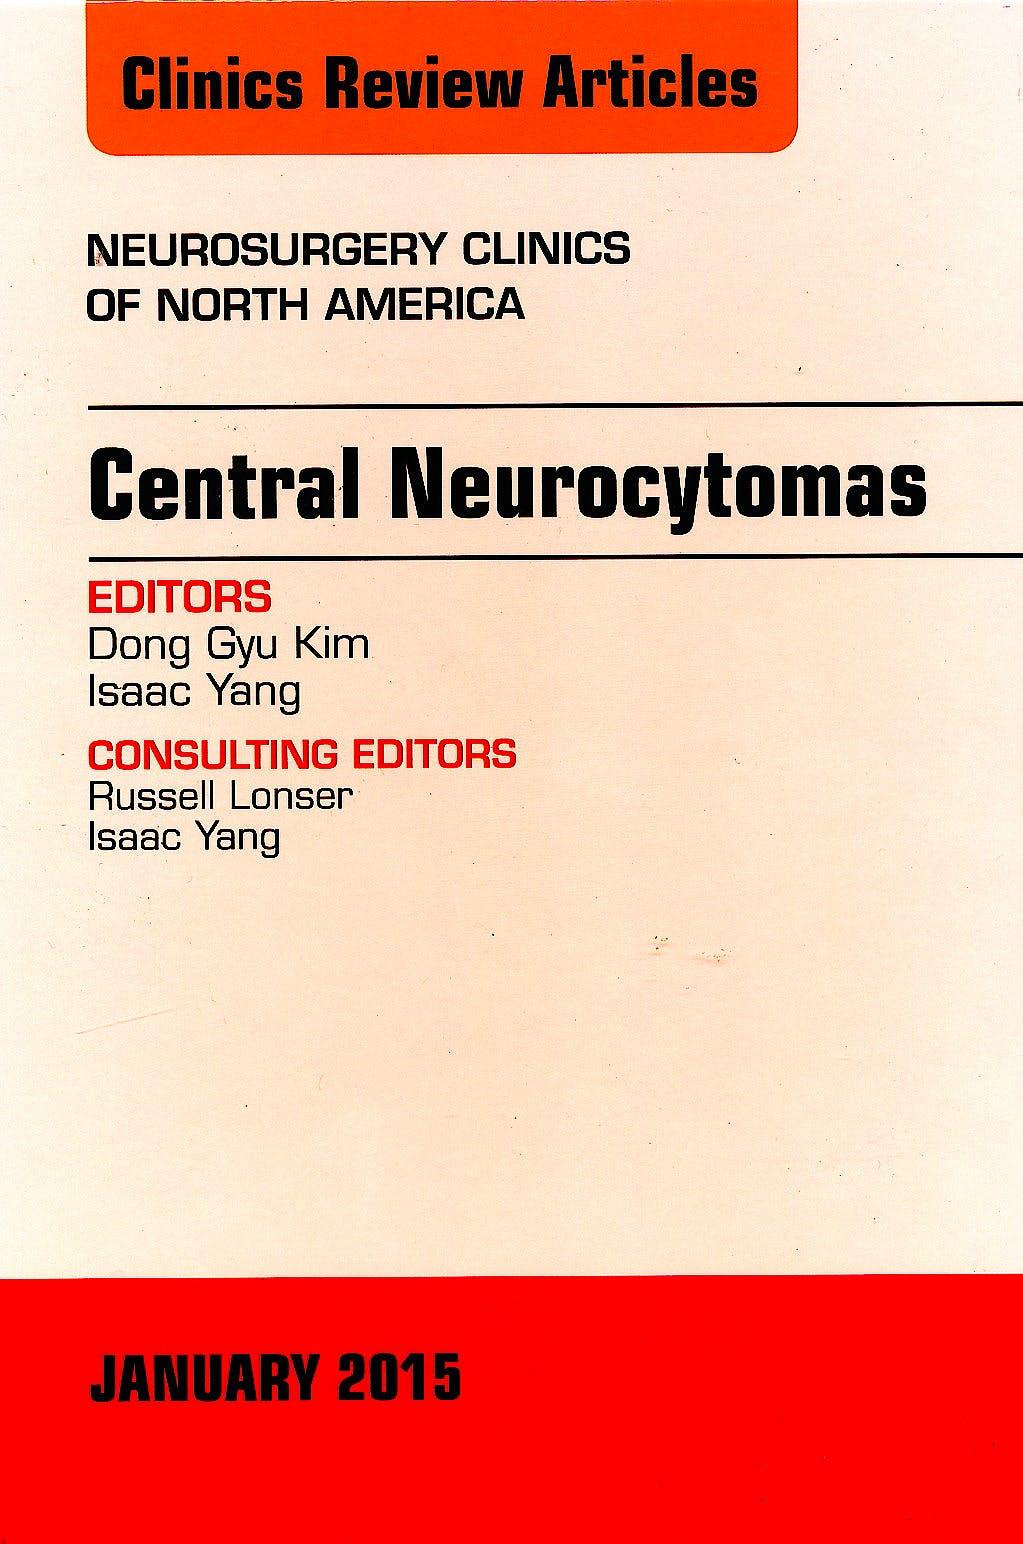 Portada del libro 9780323341790 Central Neurocytomas, an Issue of Neurosurgery Clinics of North America, Vol. 26-1